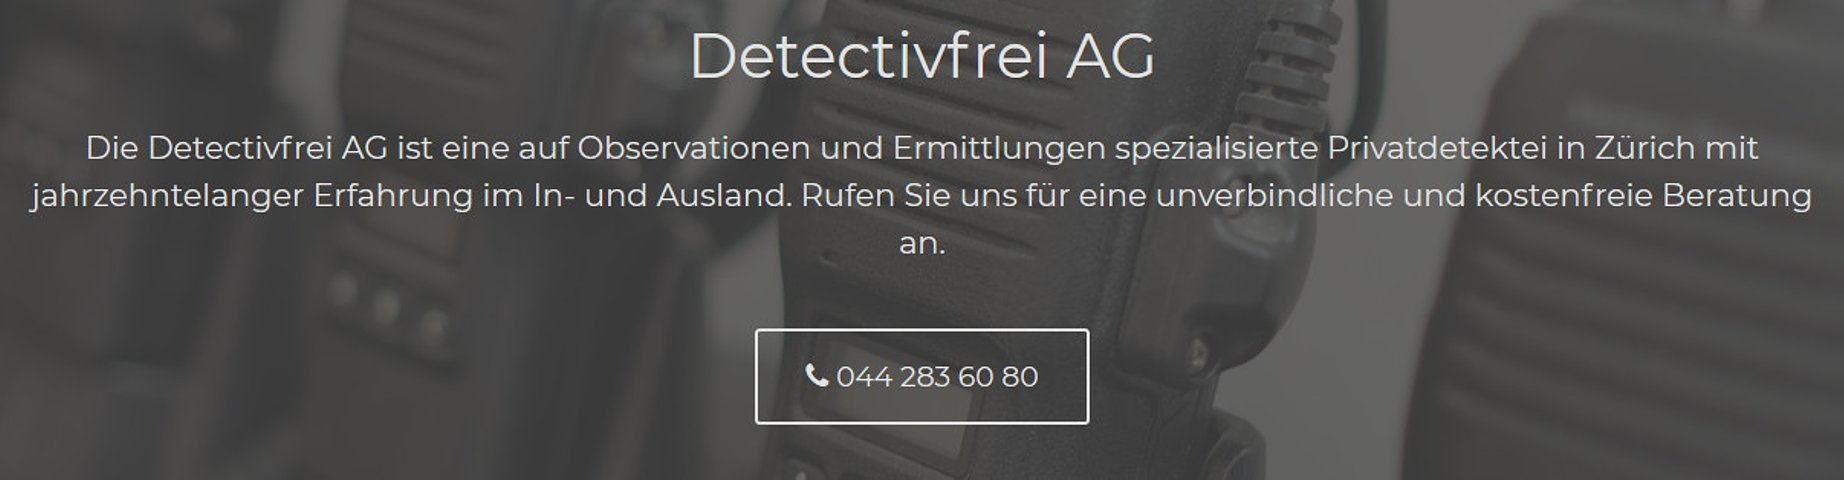 Detectivfrei AG